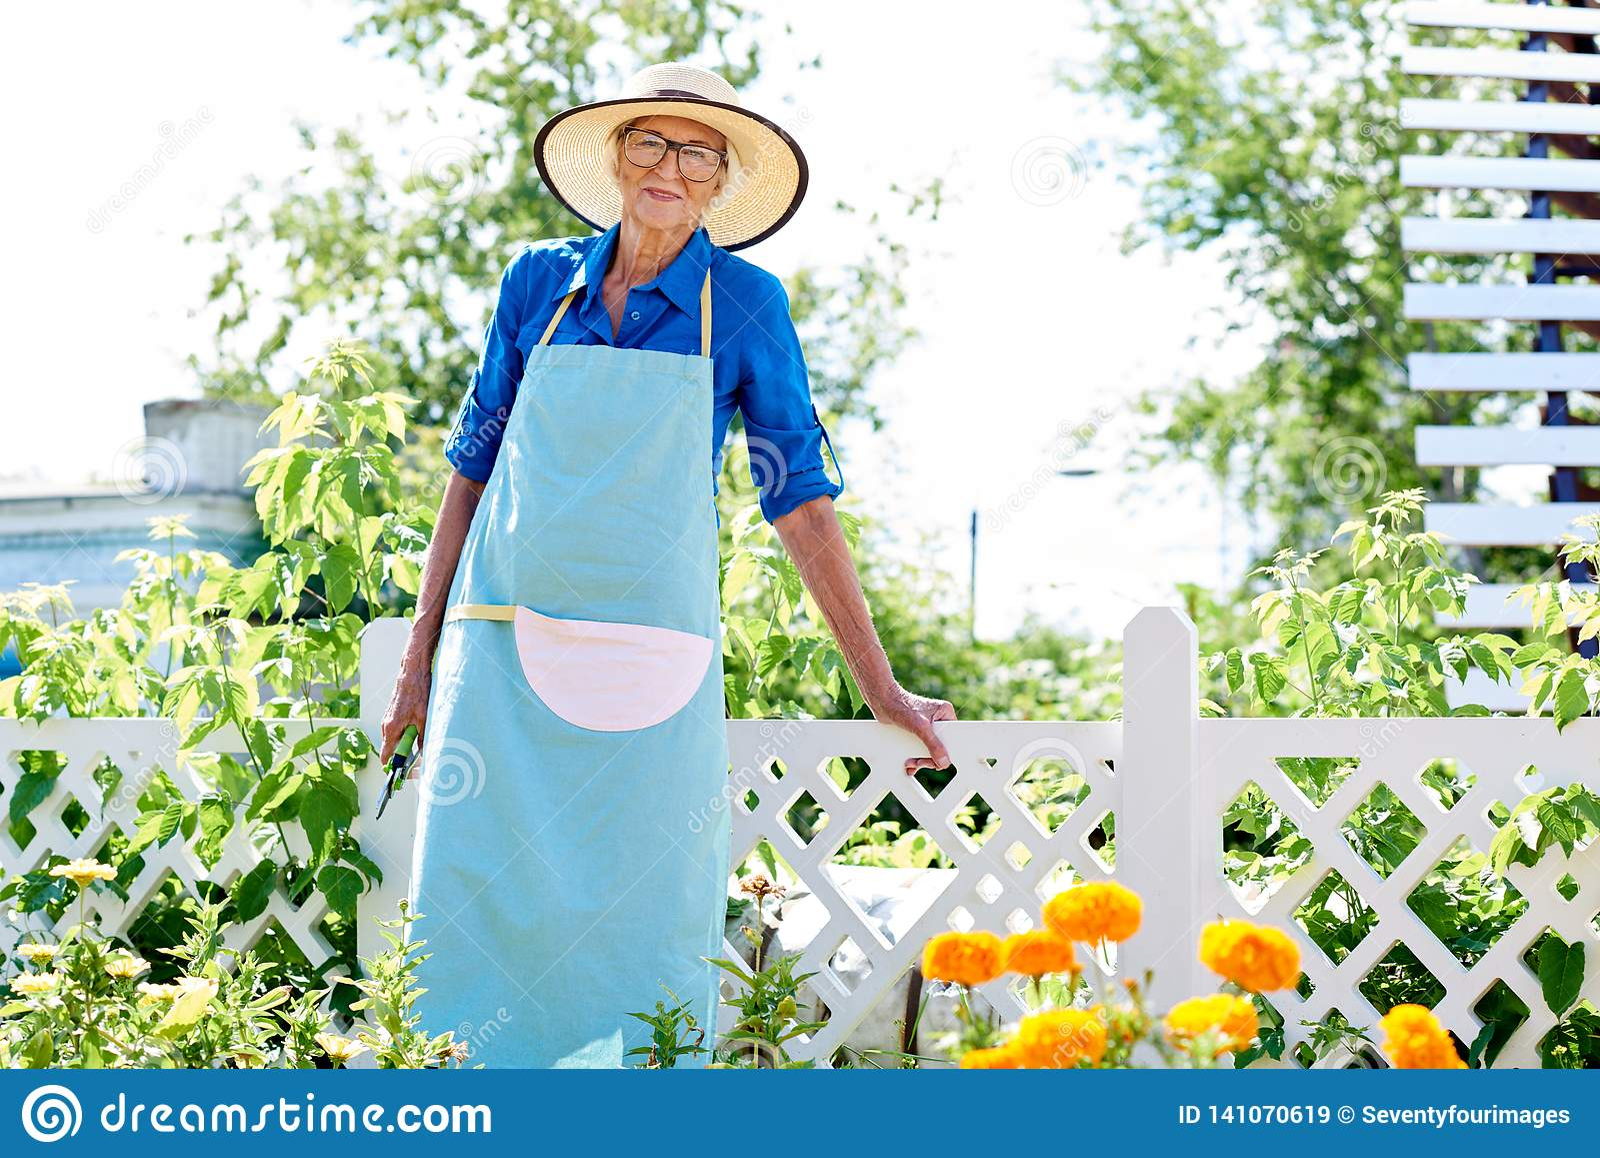 Smiling Senior Gardener Posing